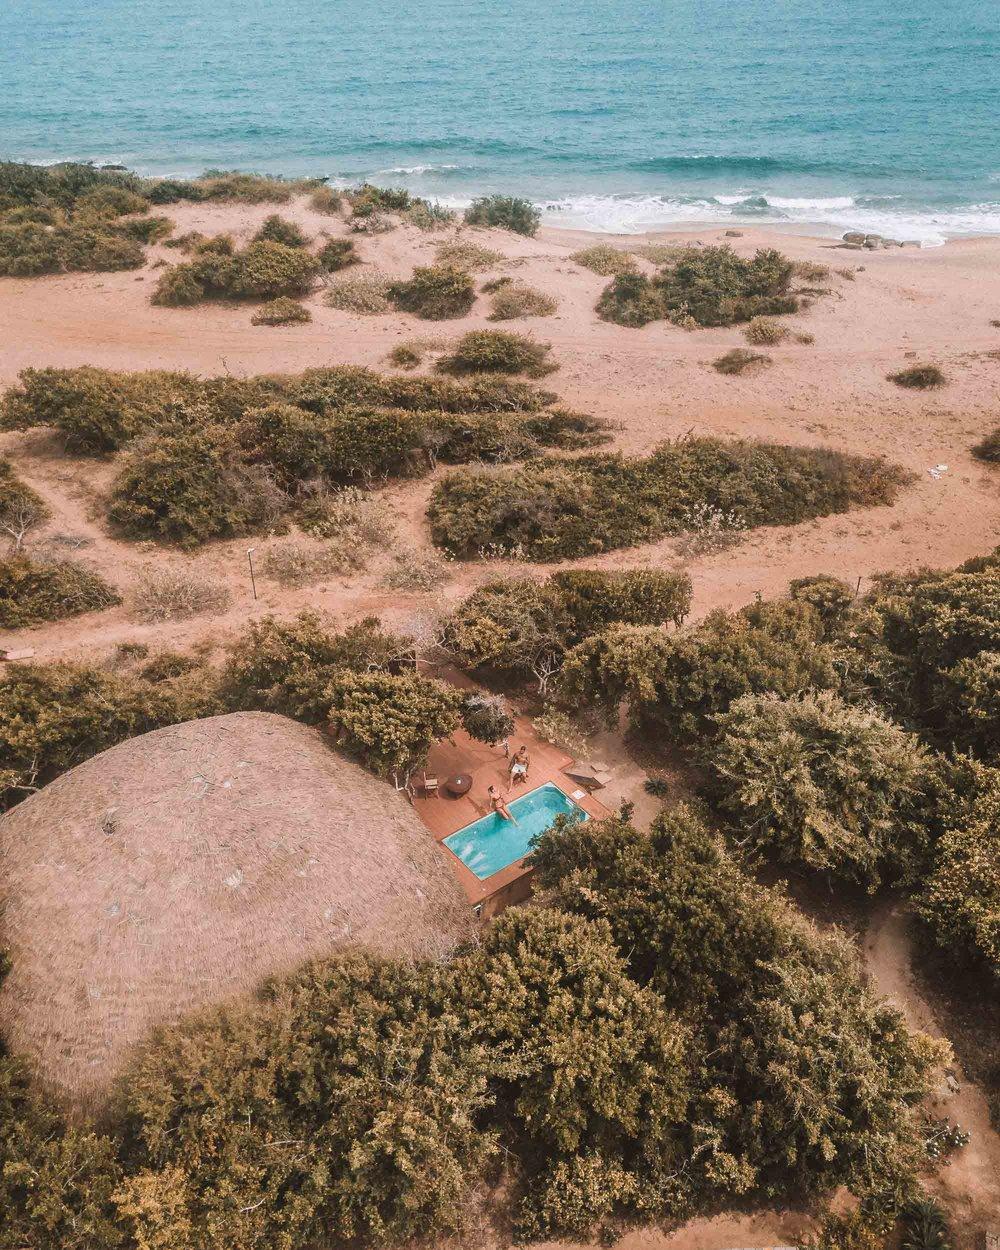 Yala national park Chena Huts uga escapes villa view beach front property best safari camp in Sri Lanka